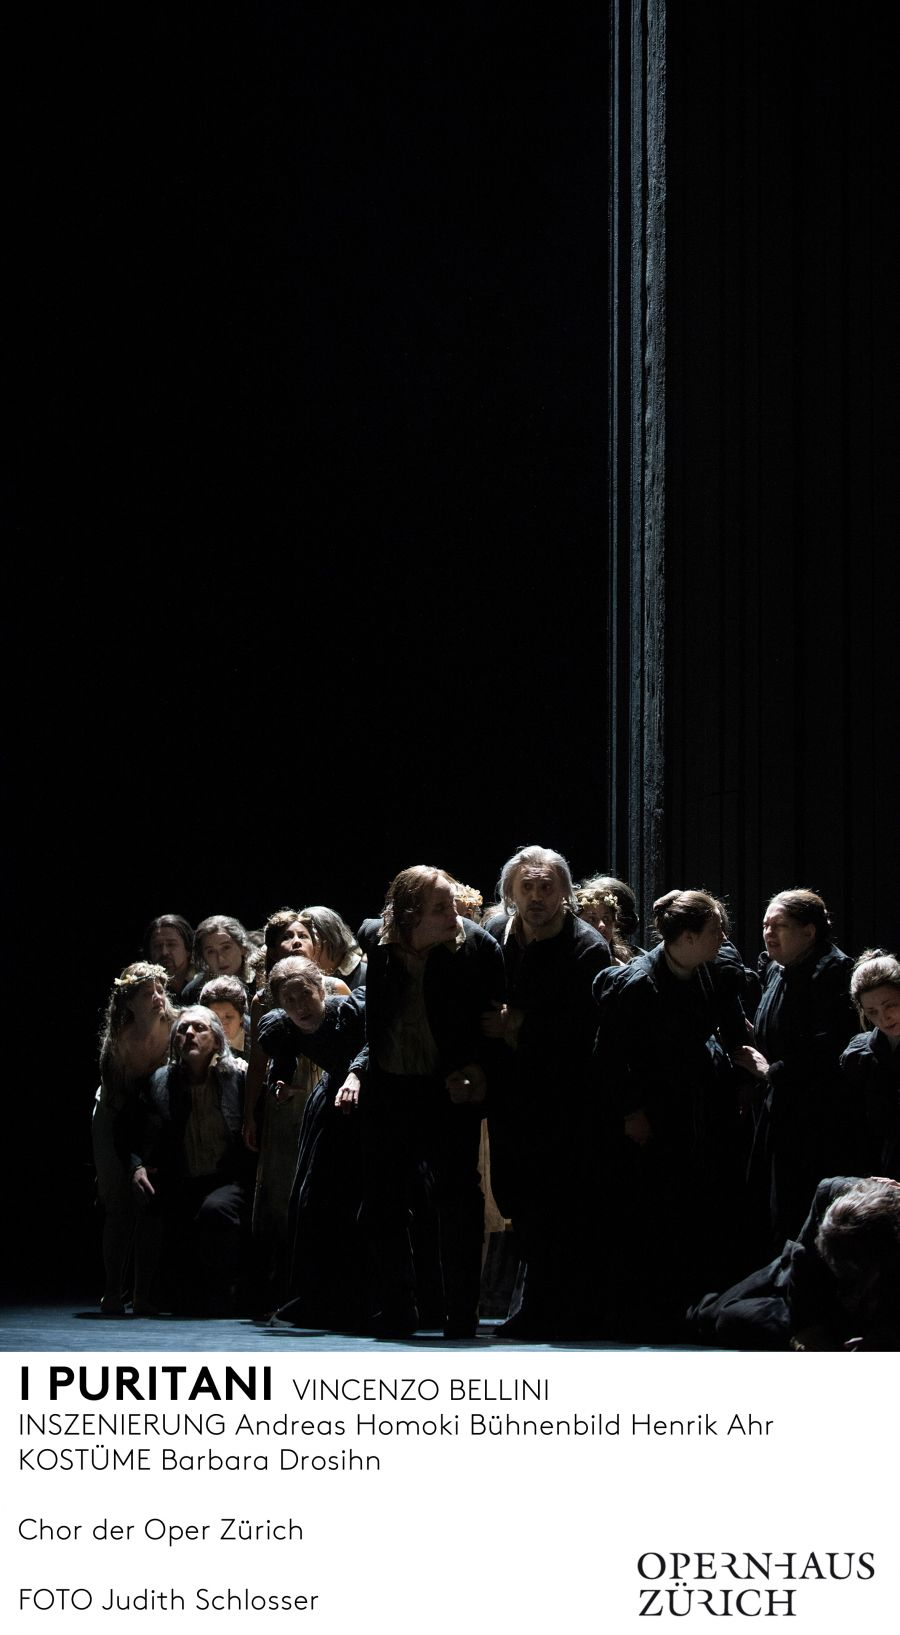 Ph.: Judith Schlosser/ Zürich Opernhaus - Le foto sono relative a un cast diverso.